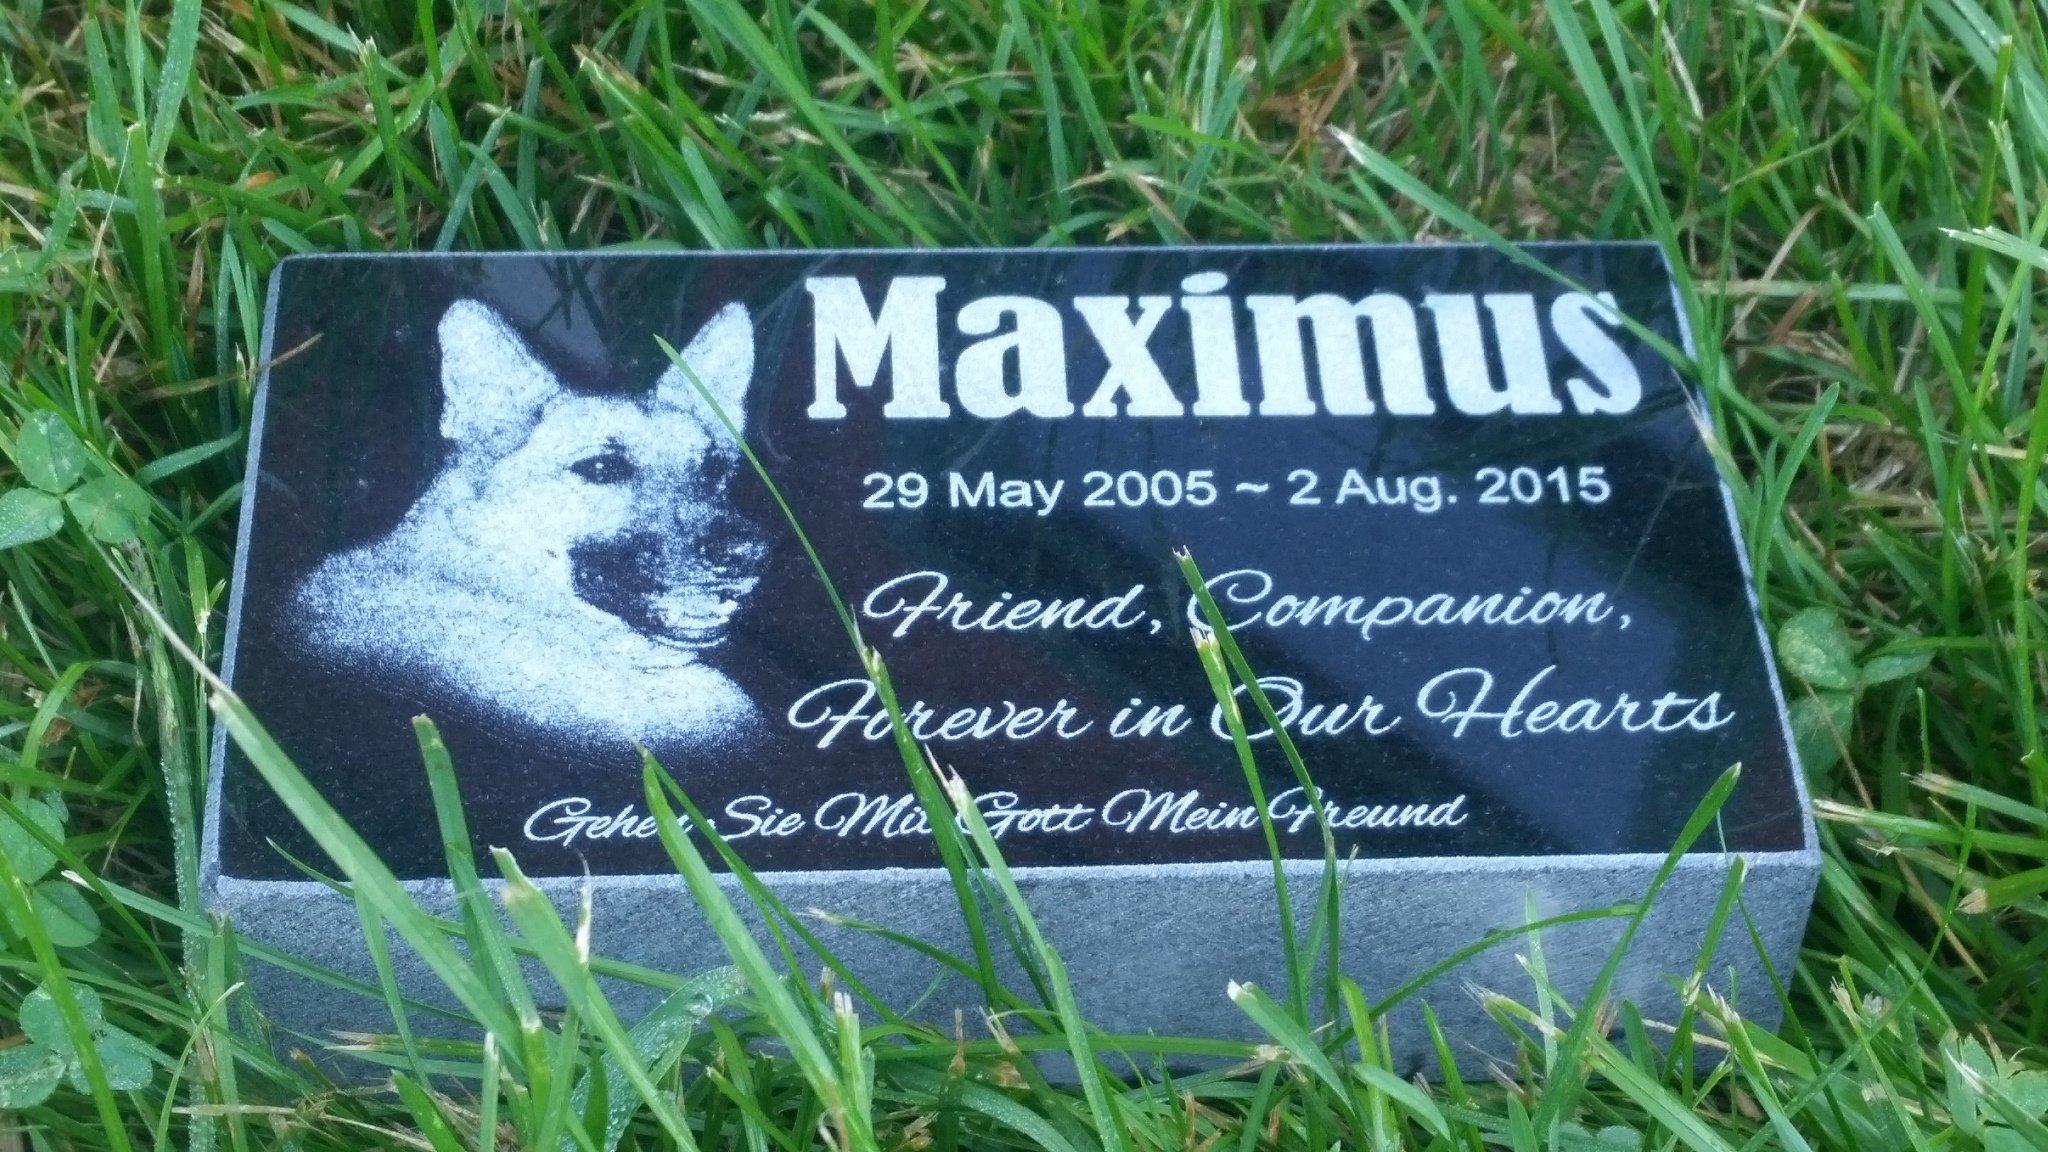 Personalised Pet Stone Memorial Marker Granite Marker Dog Cat Horse Bird Human 4'' X 7'' X 2'' Custom Design Personalized Akita Bulldog Bull Dog